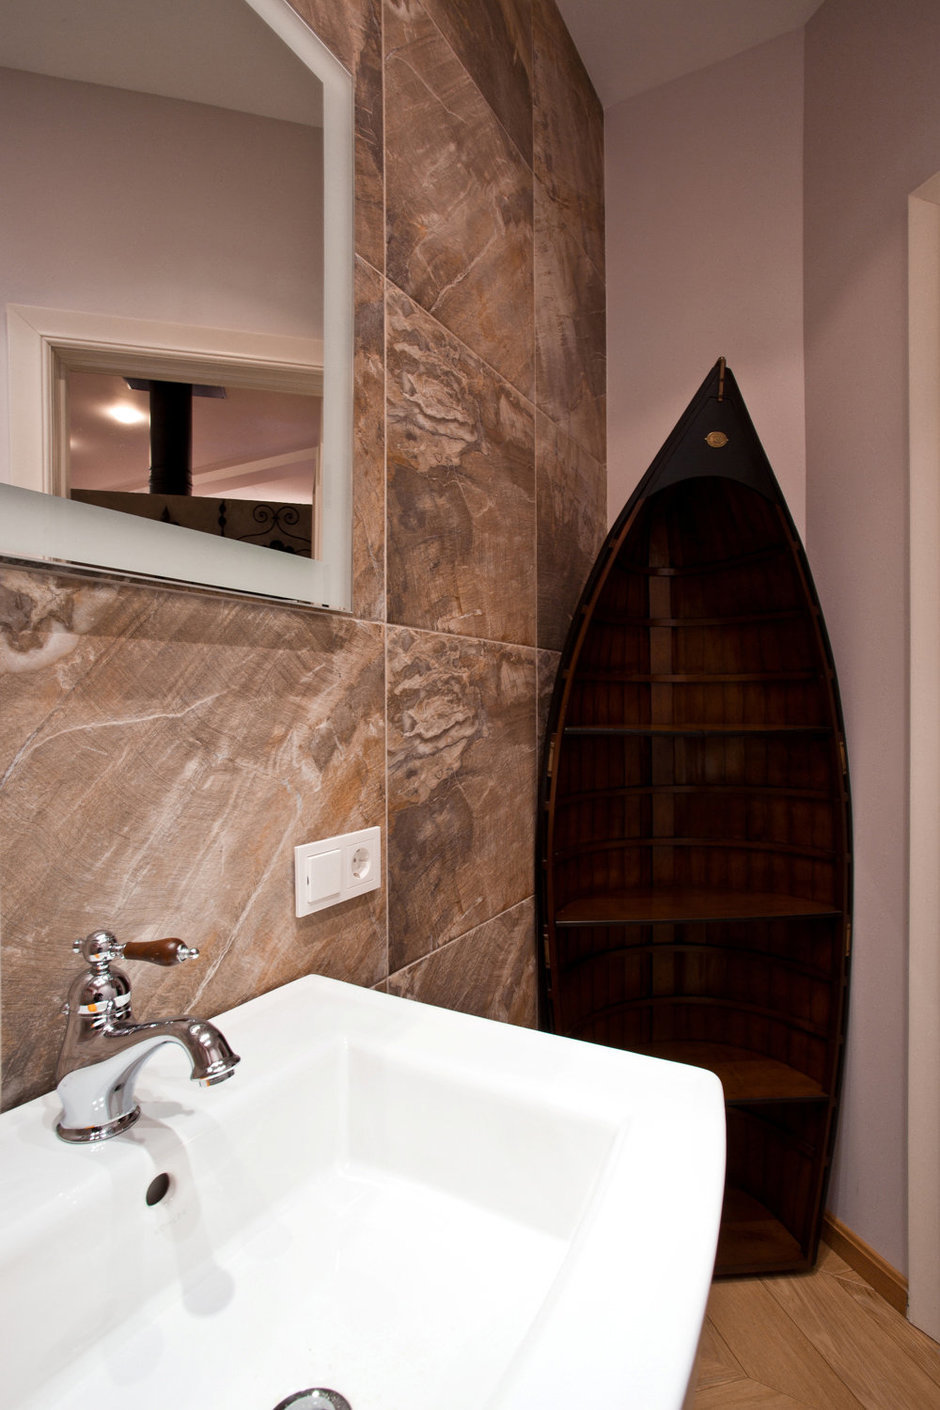 Фотография: Ванная в стиле Эклектика, Эко, Квартира, Проект недели – фото на InMyRoom.ru